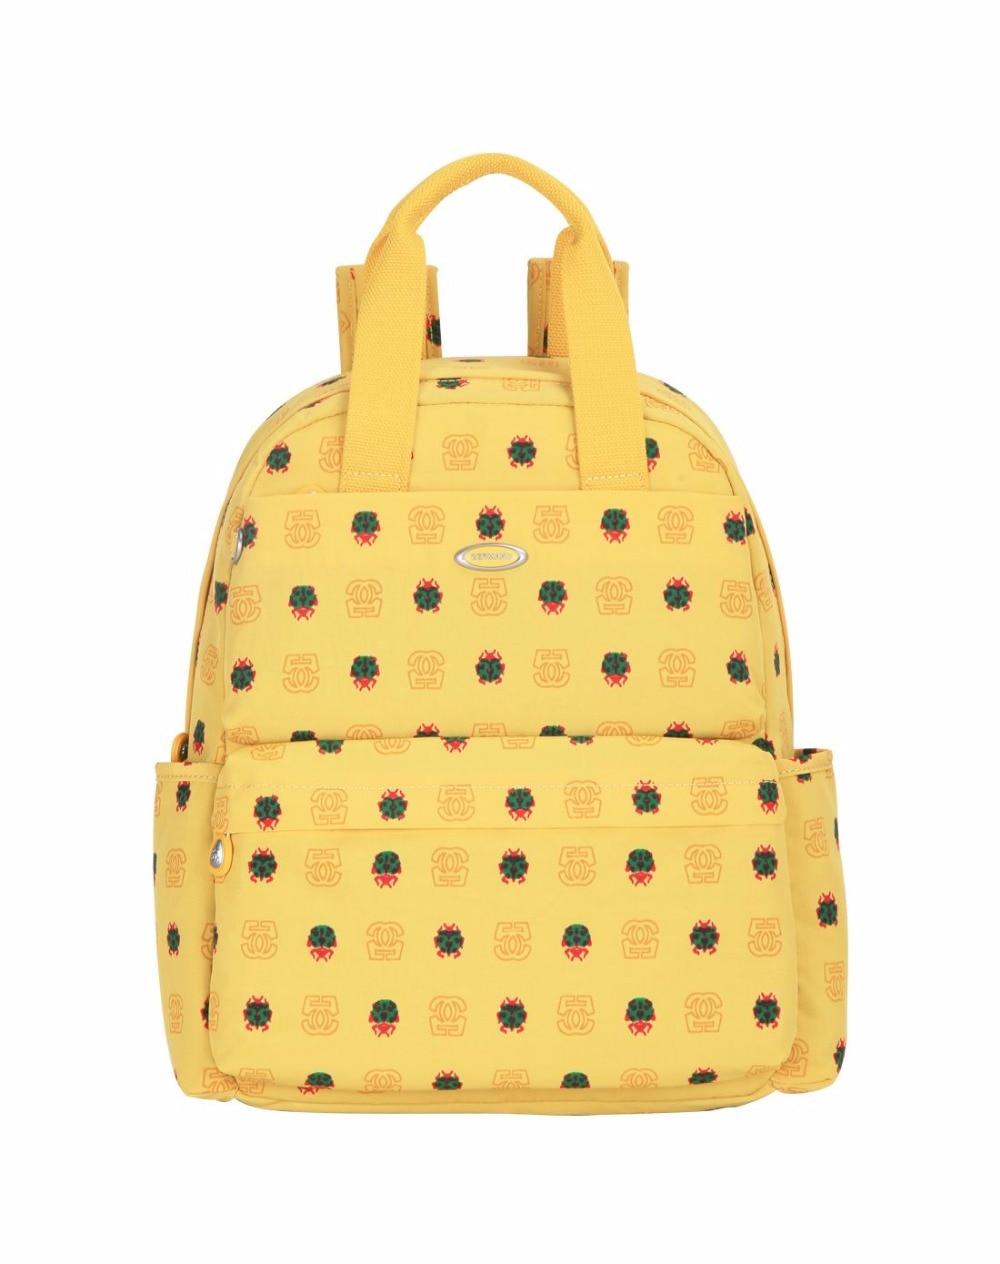 ФОТО Germano Famous Brand Kip Backpack Girls School Bag Waterproof Nylon Women Backpack Fashion lady Backpack Casual Knapsack